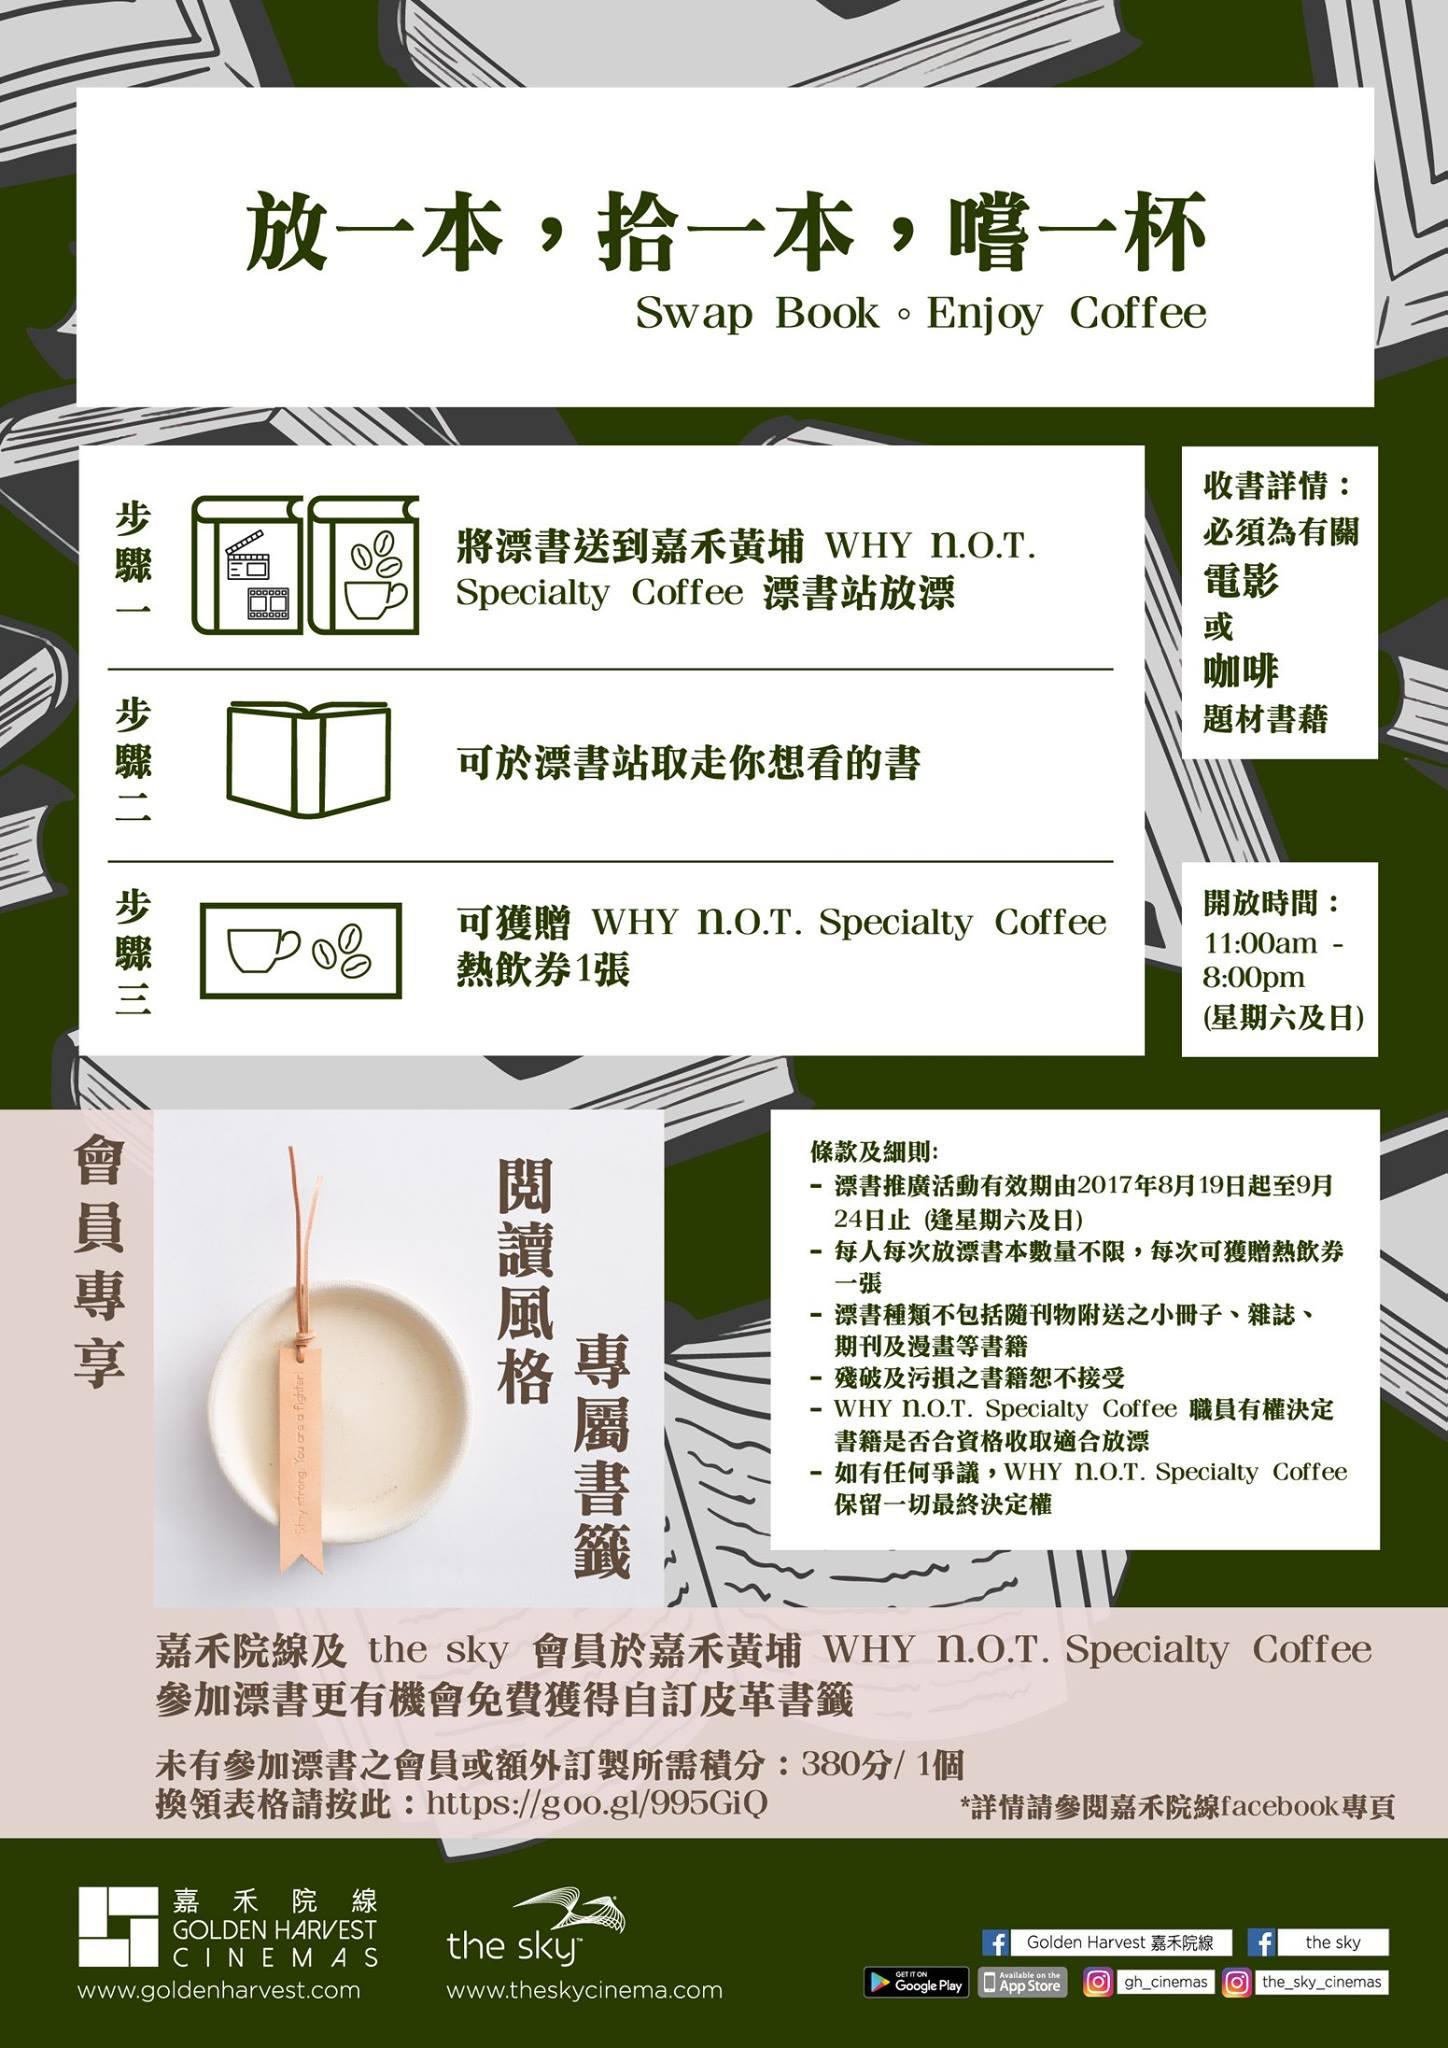 Swap Book . Enjoy Coffee